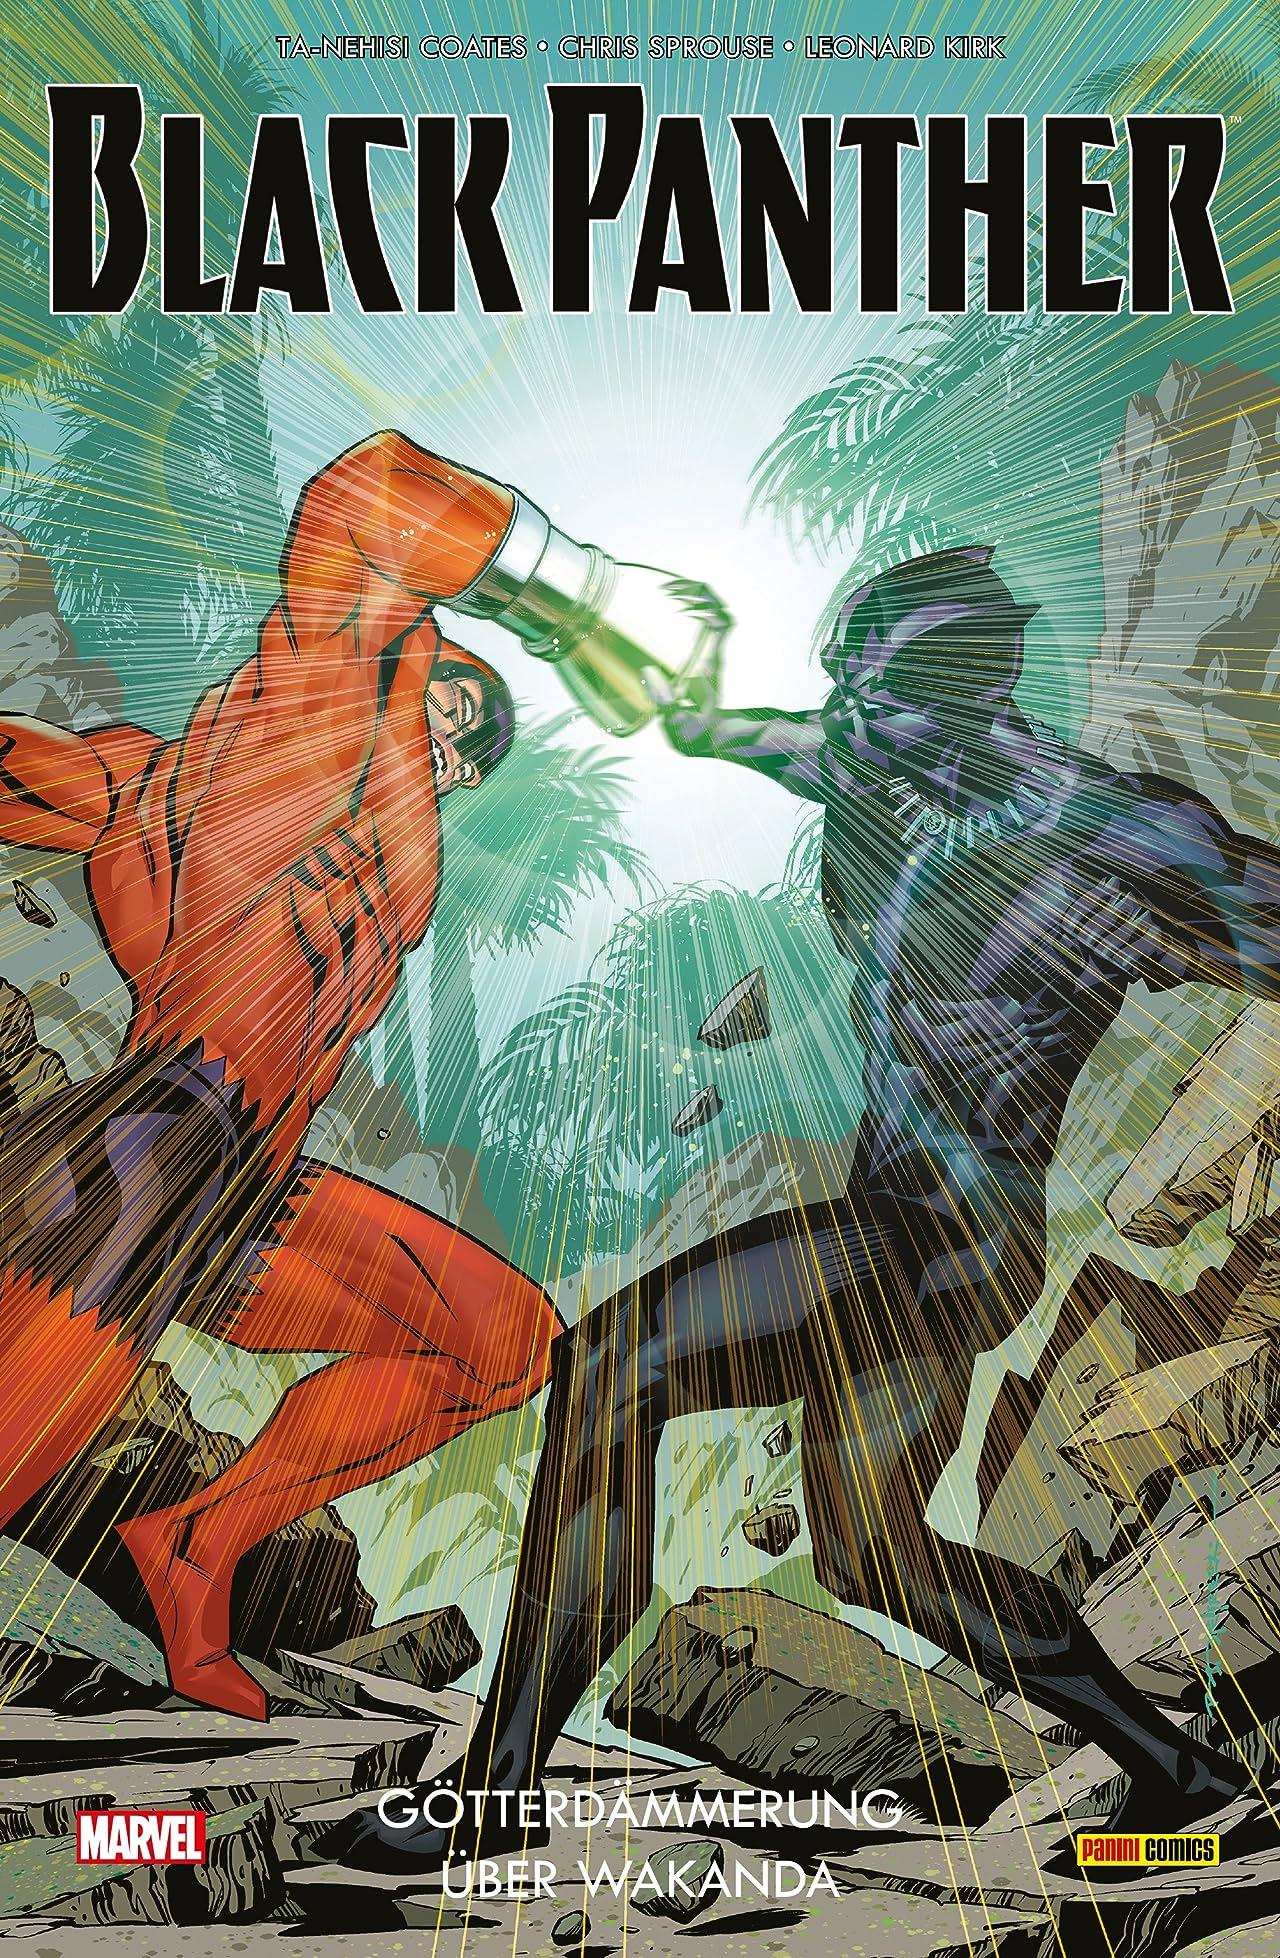 Black Panther Vol. 5: Götterdämmerung über Wakanda